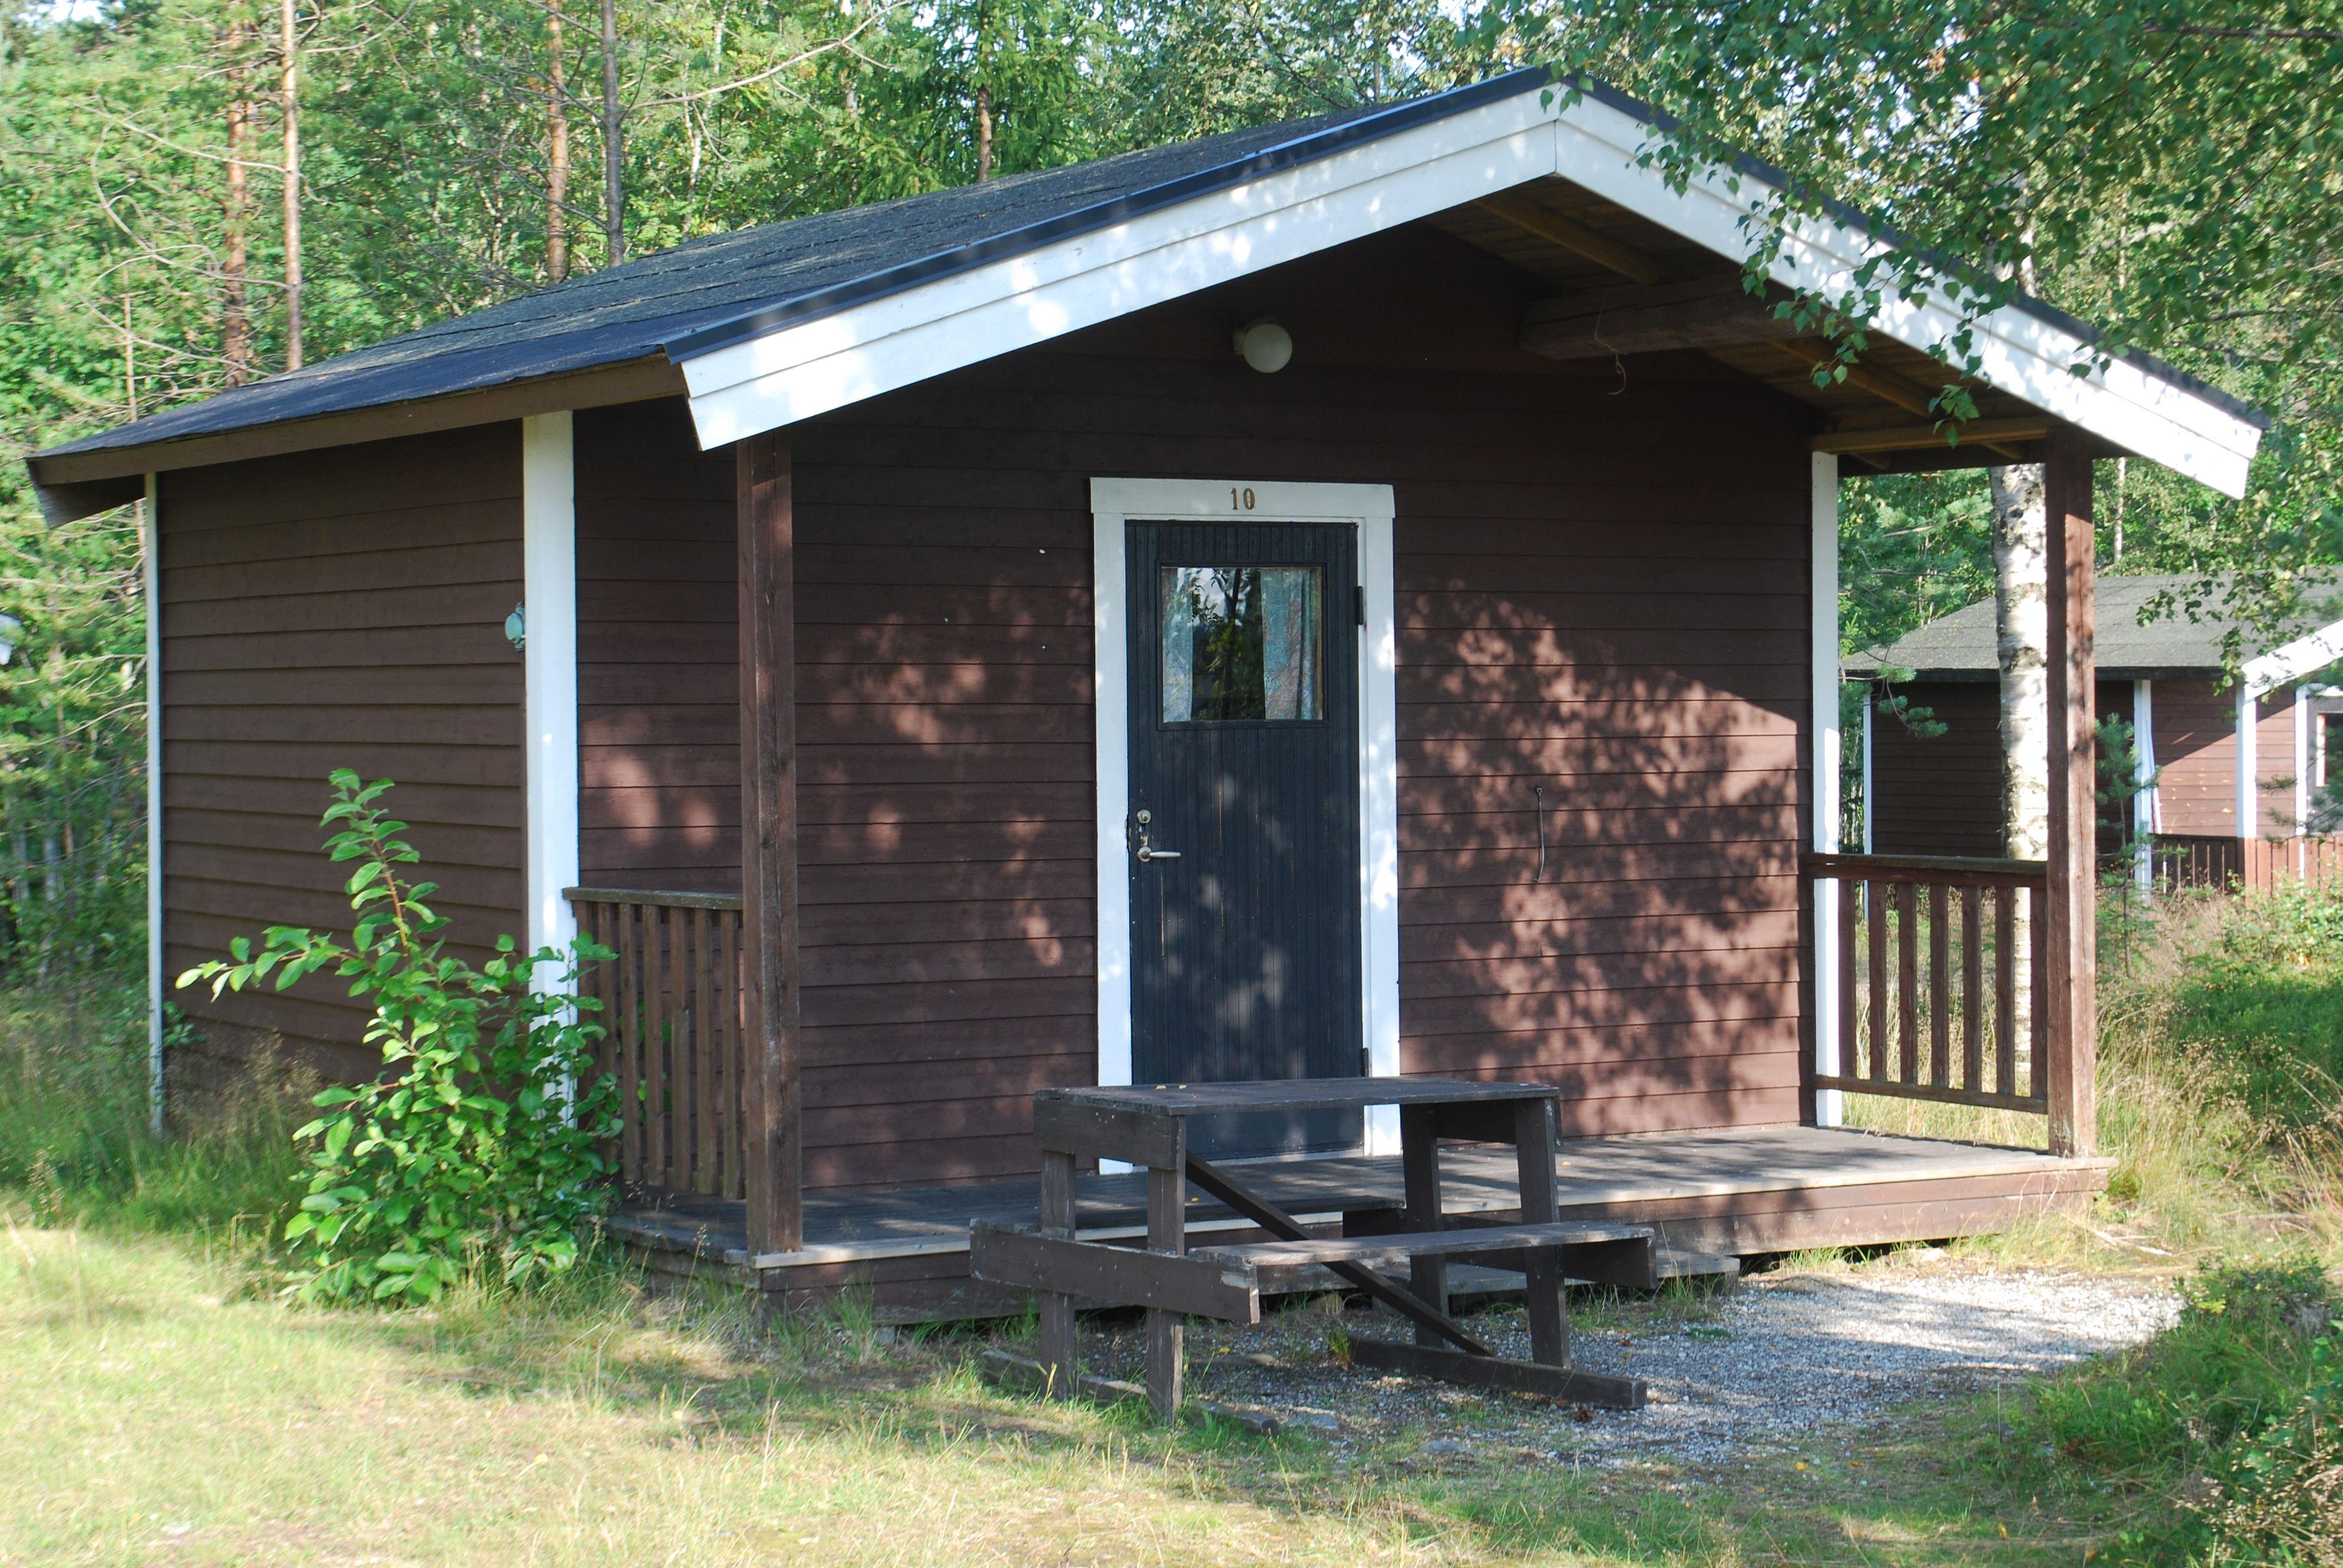 Cottage (4 beds, 16 m², no WC/shower)